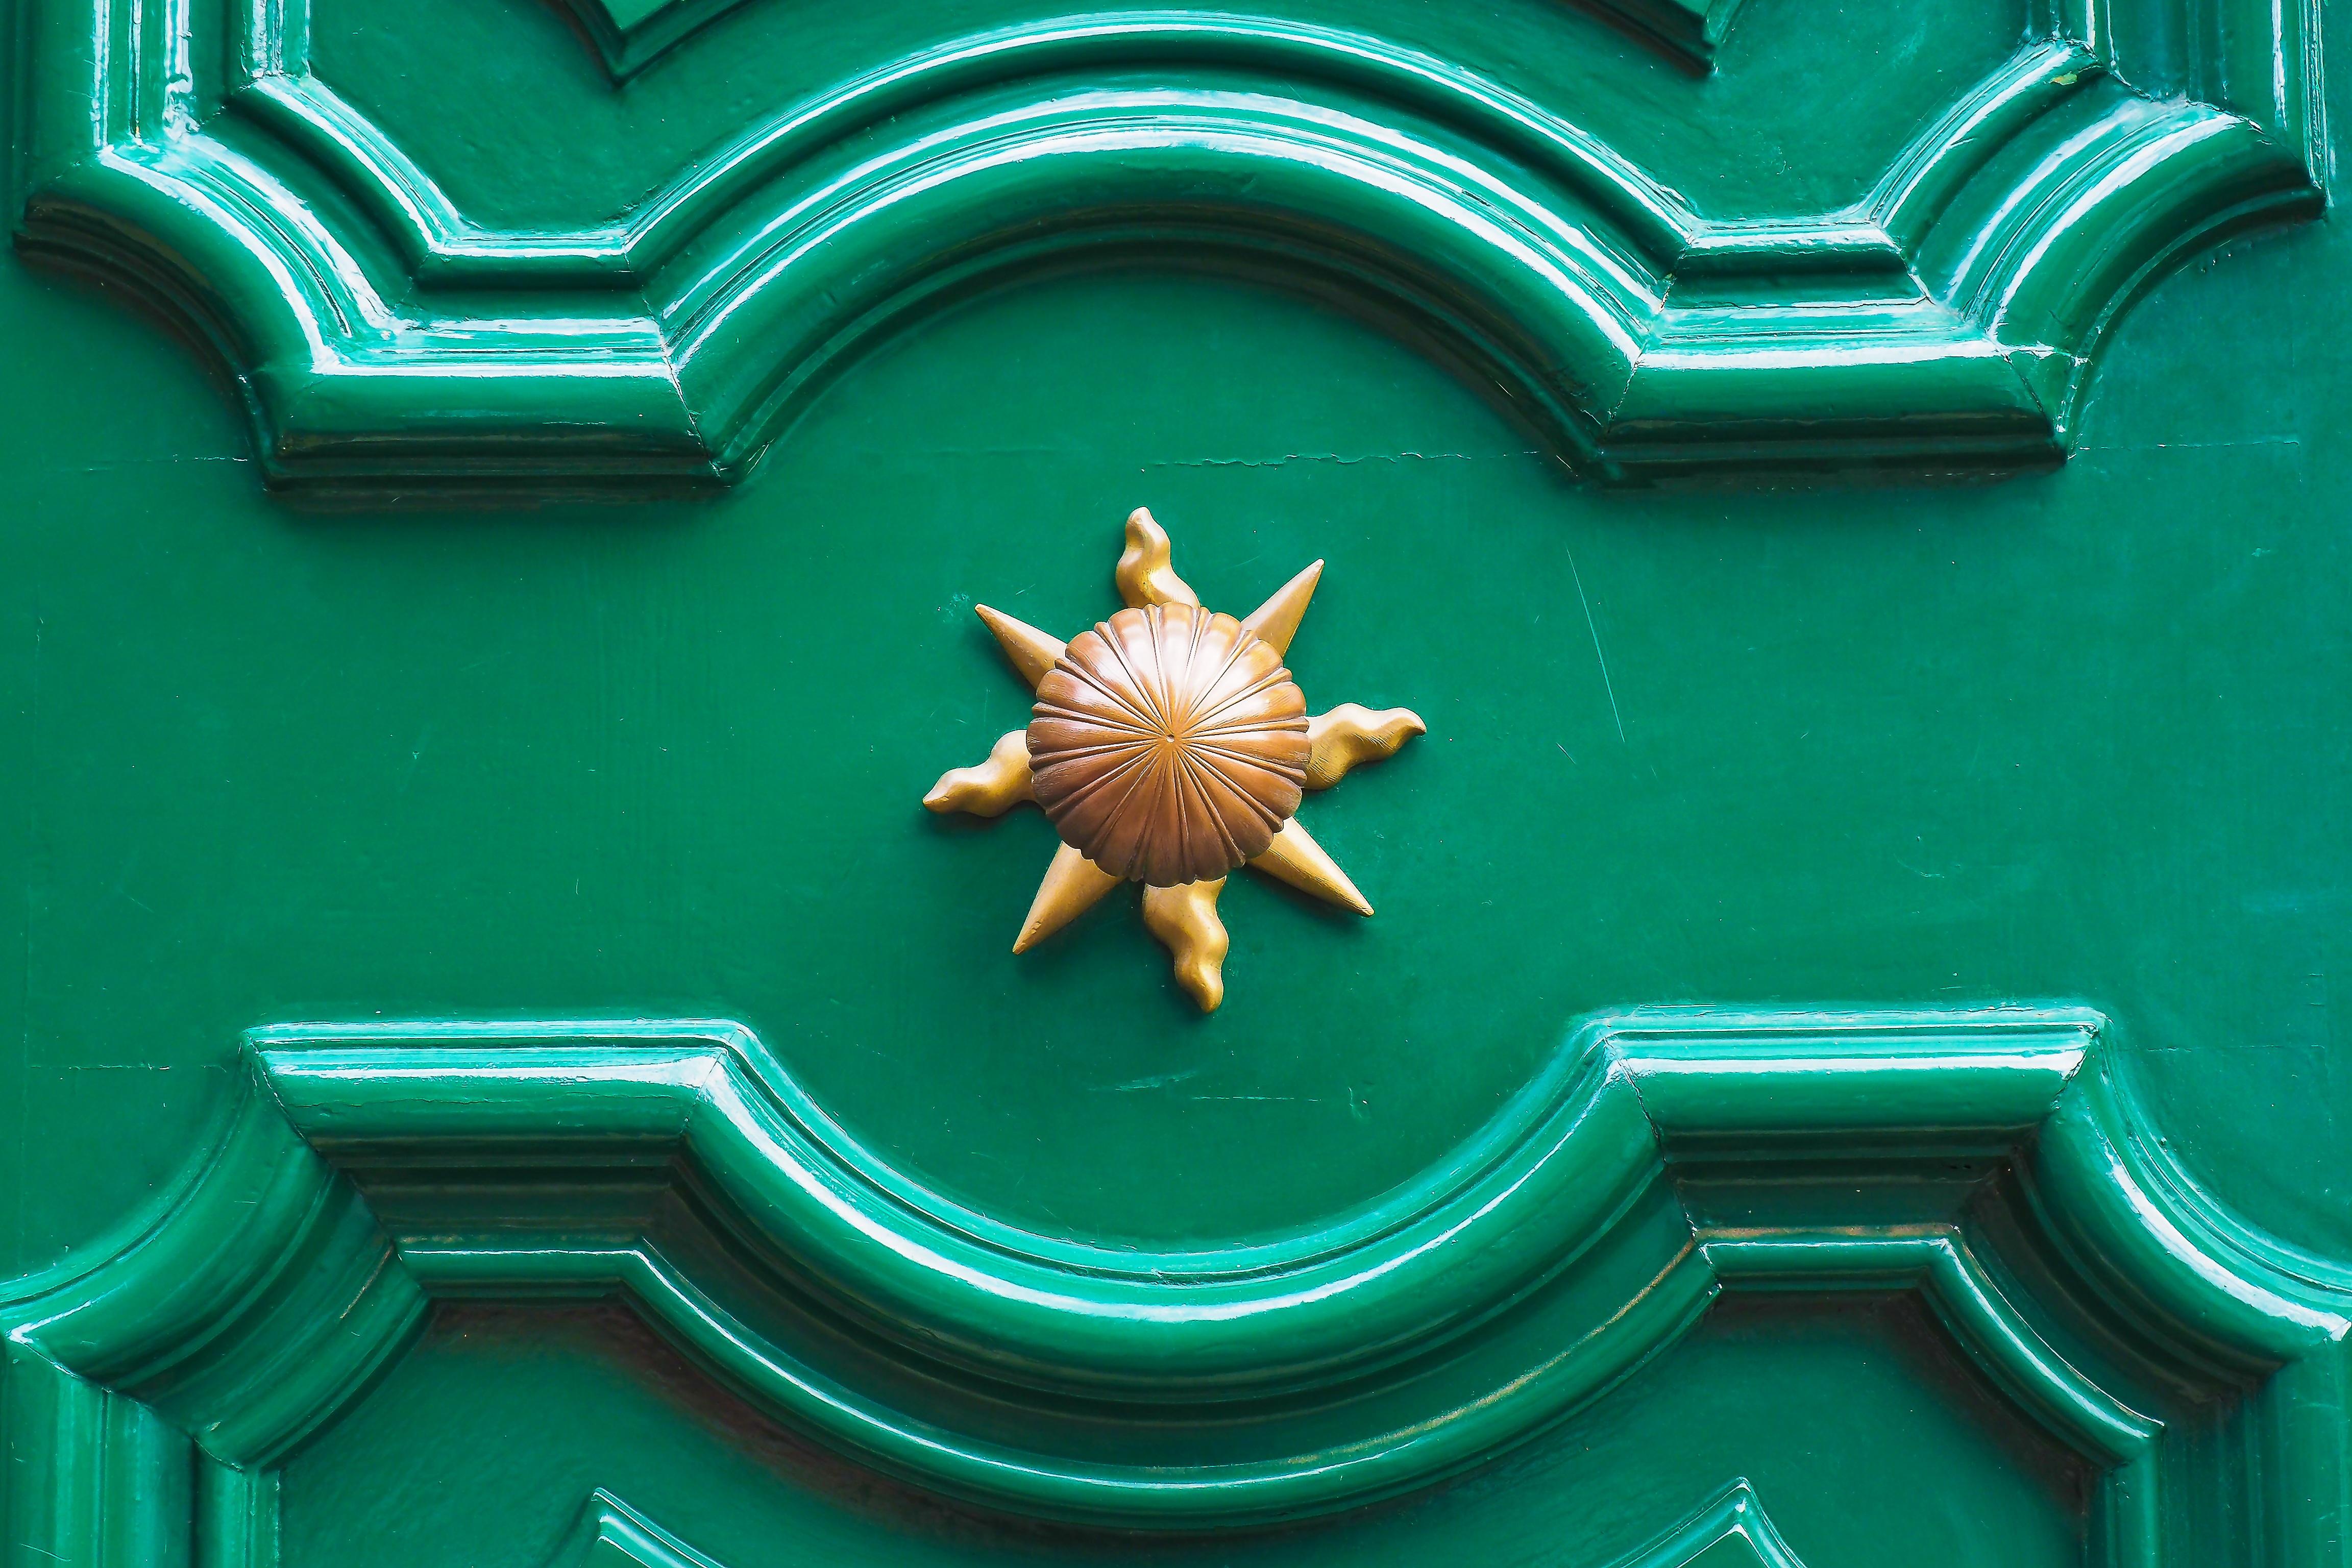 free images wood leaf window number love decoration green color metal blue close decor ornament button jewellery front door wooden door